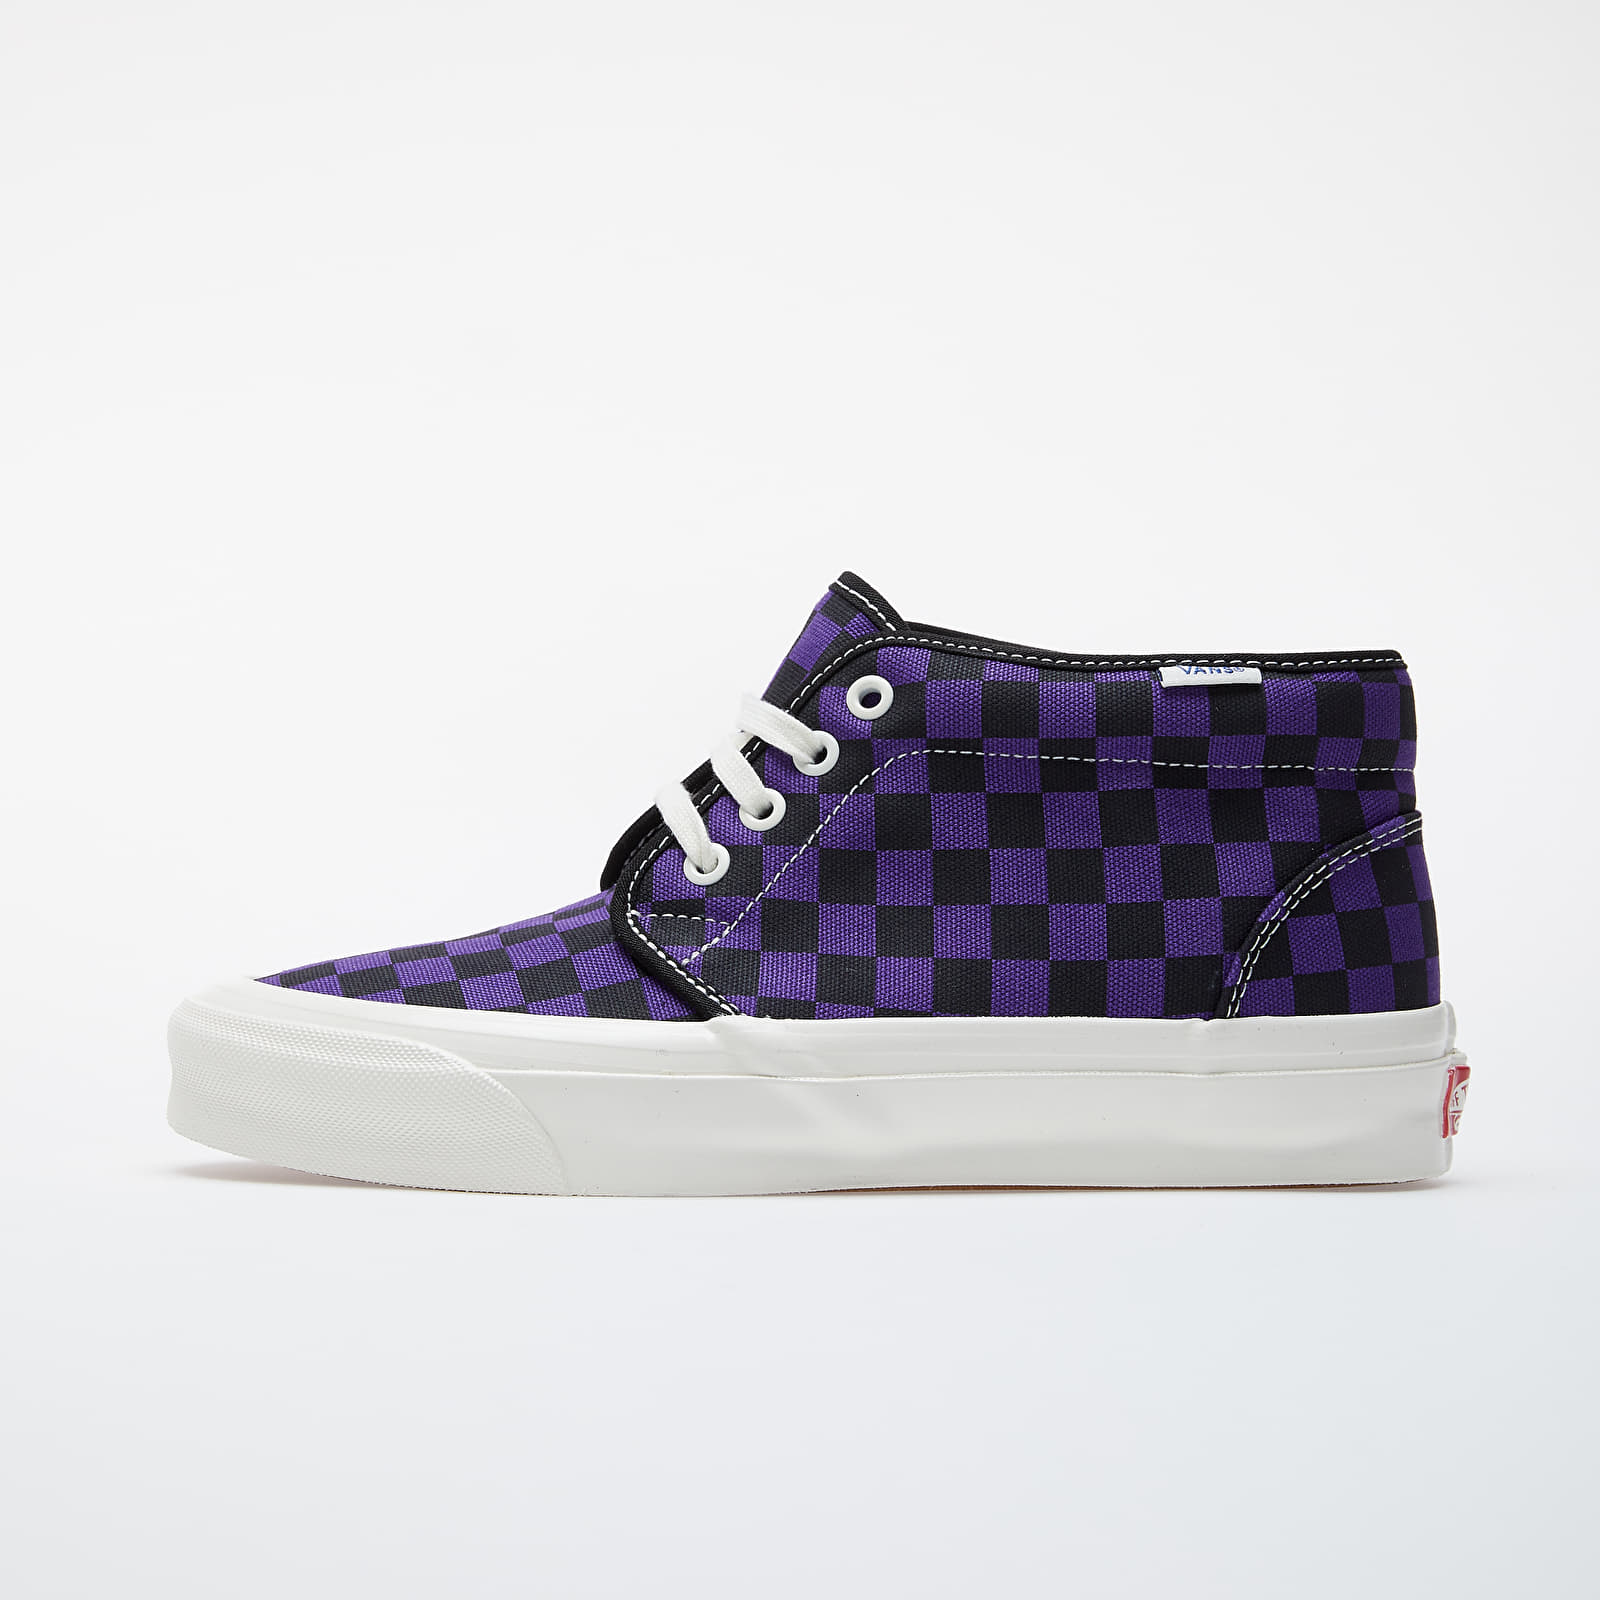 Férfi cipők Vans OG Chukka LX (Canvas/ Checkerboard) True Purple/ Grey/ Marshmallow